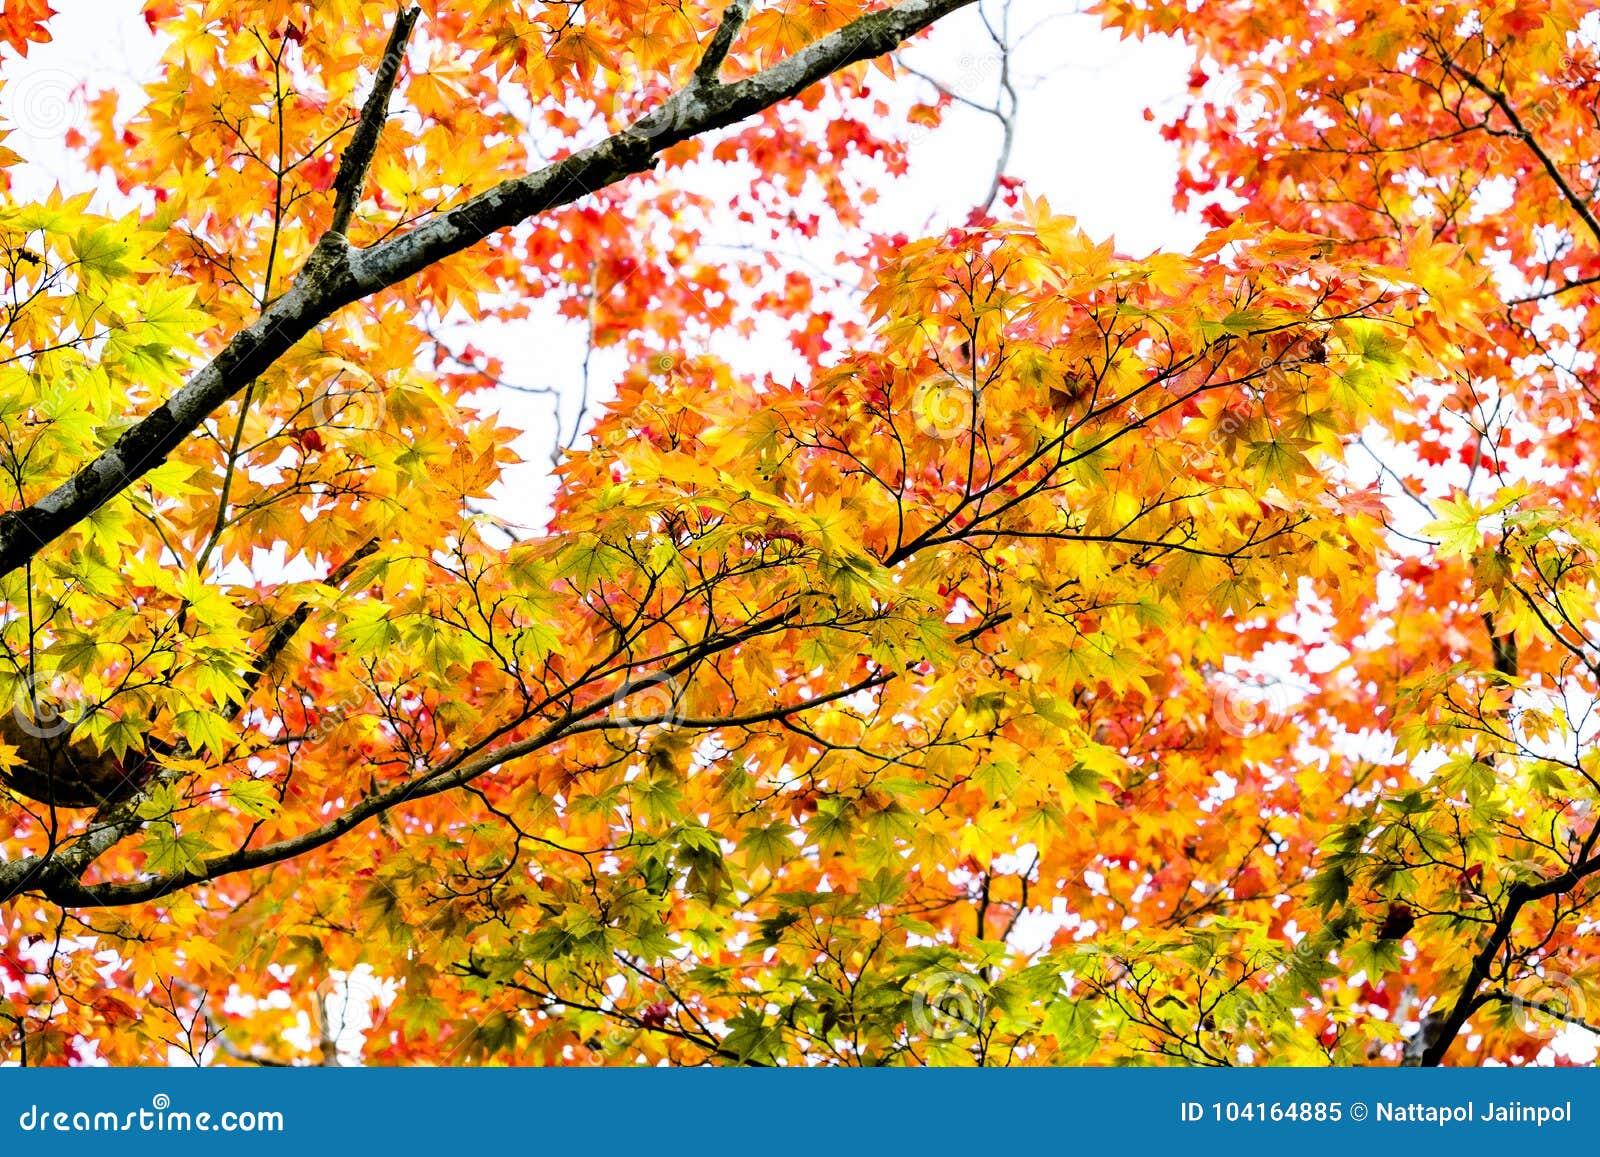 Maple Autumn Sunlight Maple Tree Branch In Autumn Turn To Red